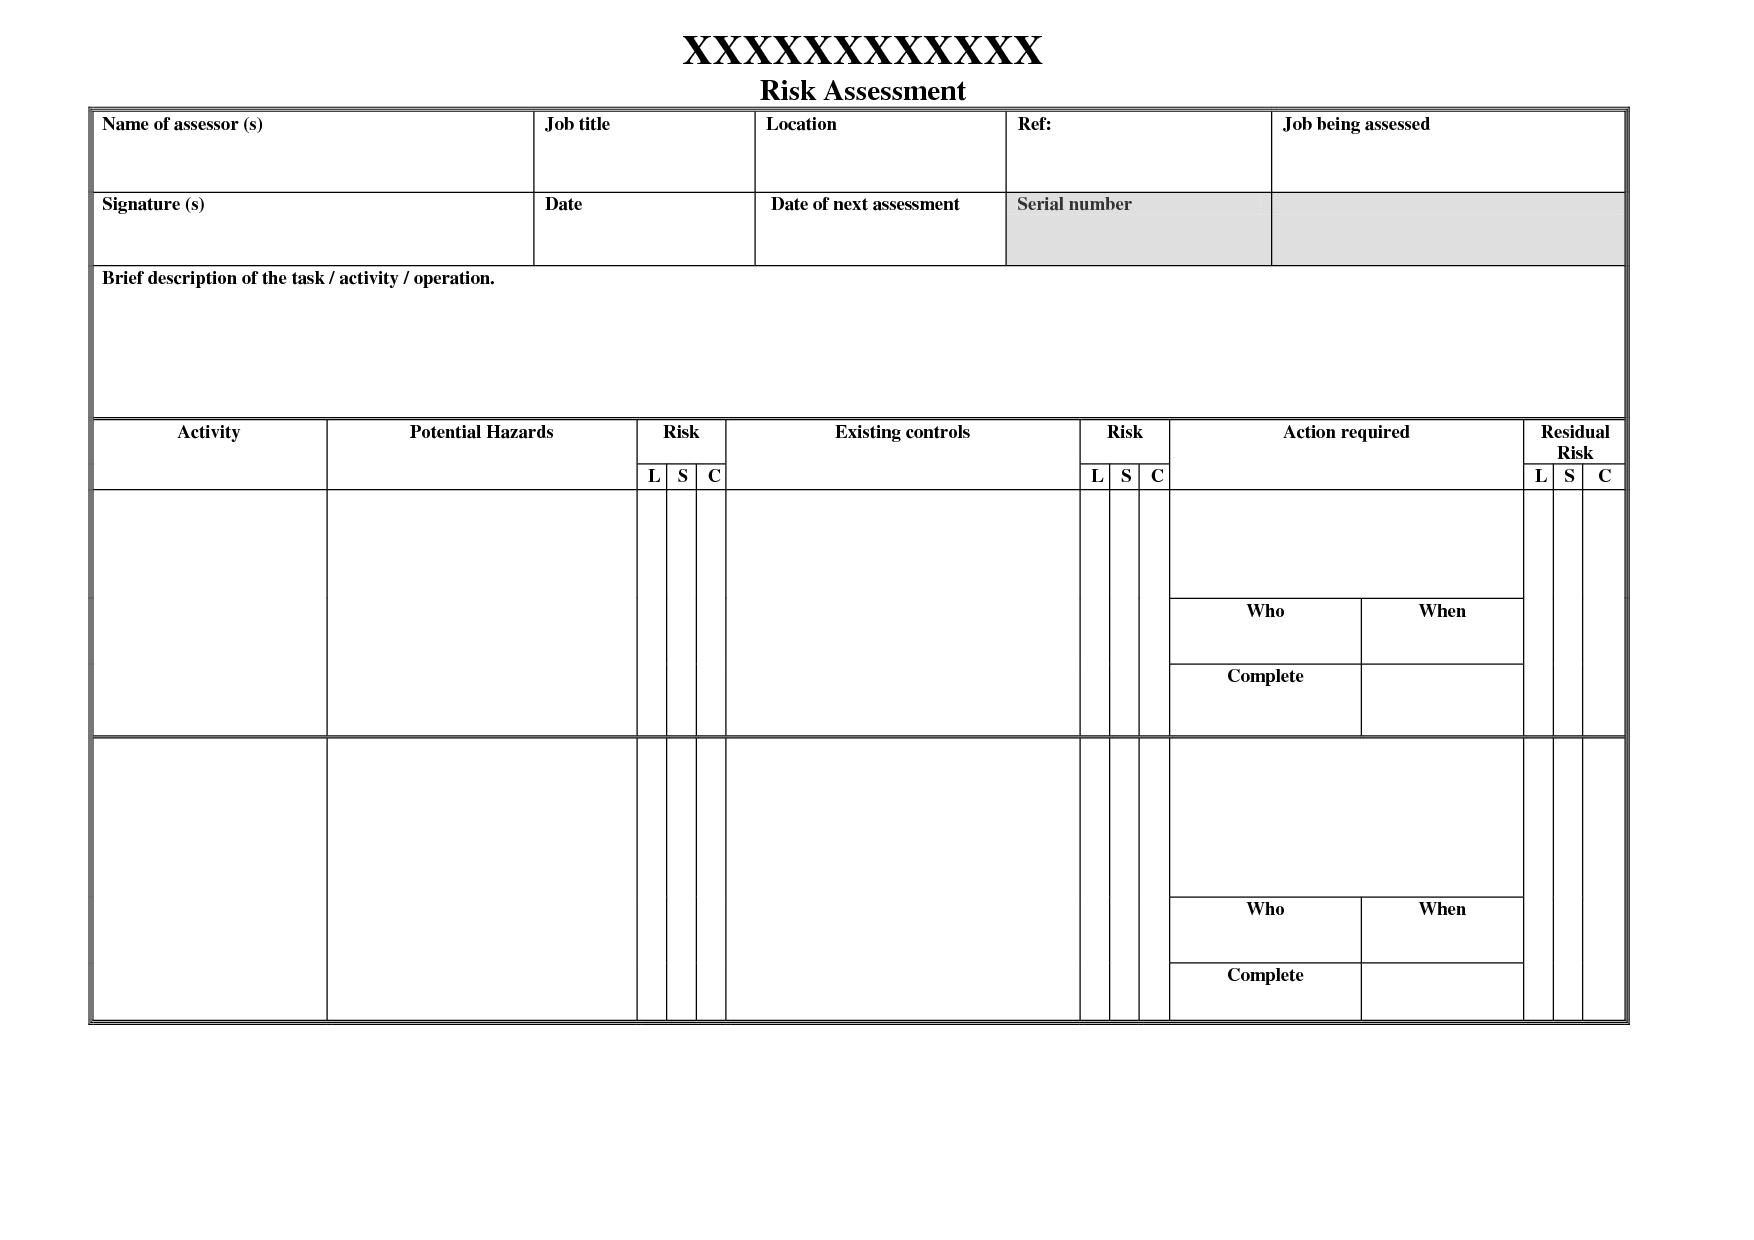 pci dss risk assessment template - blank risk assessment invitation templates designsearch